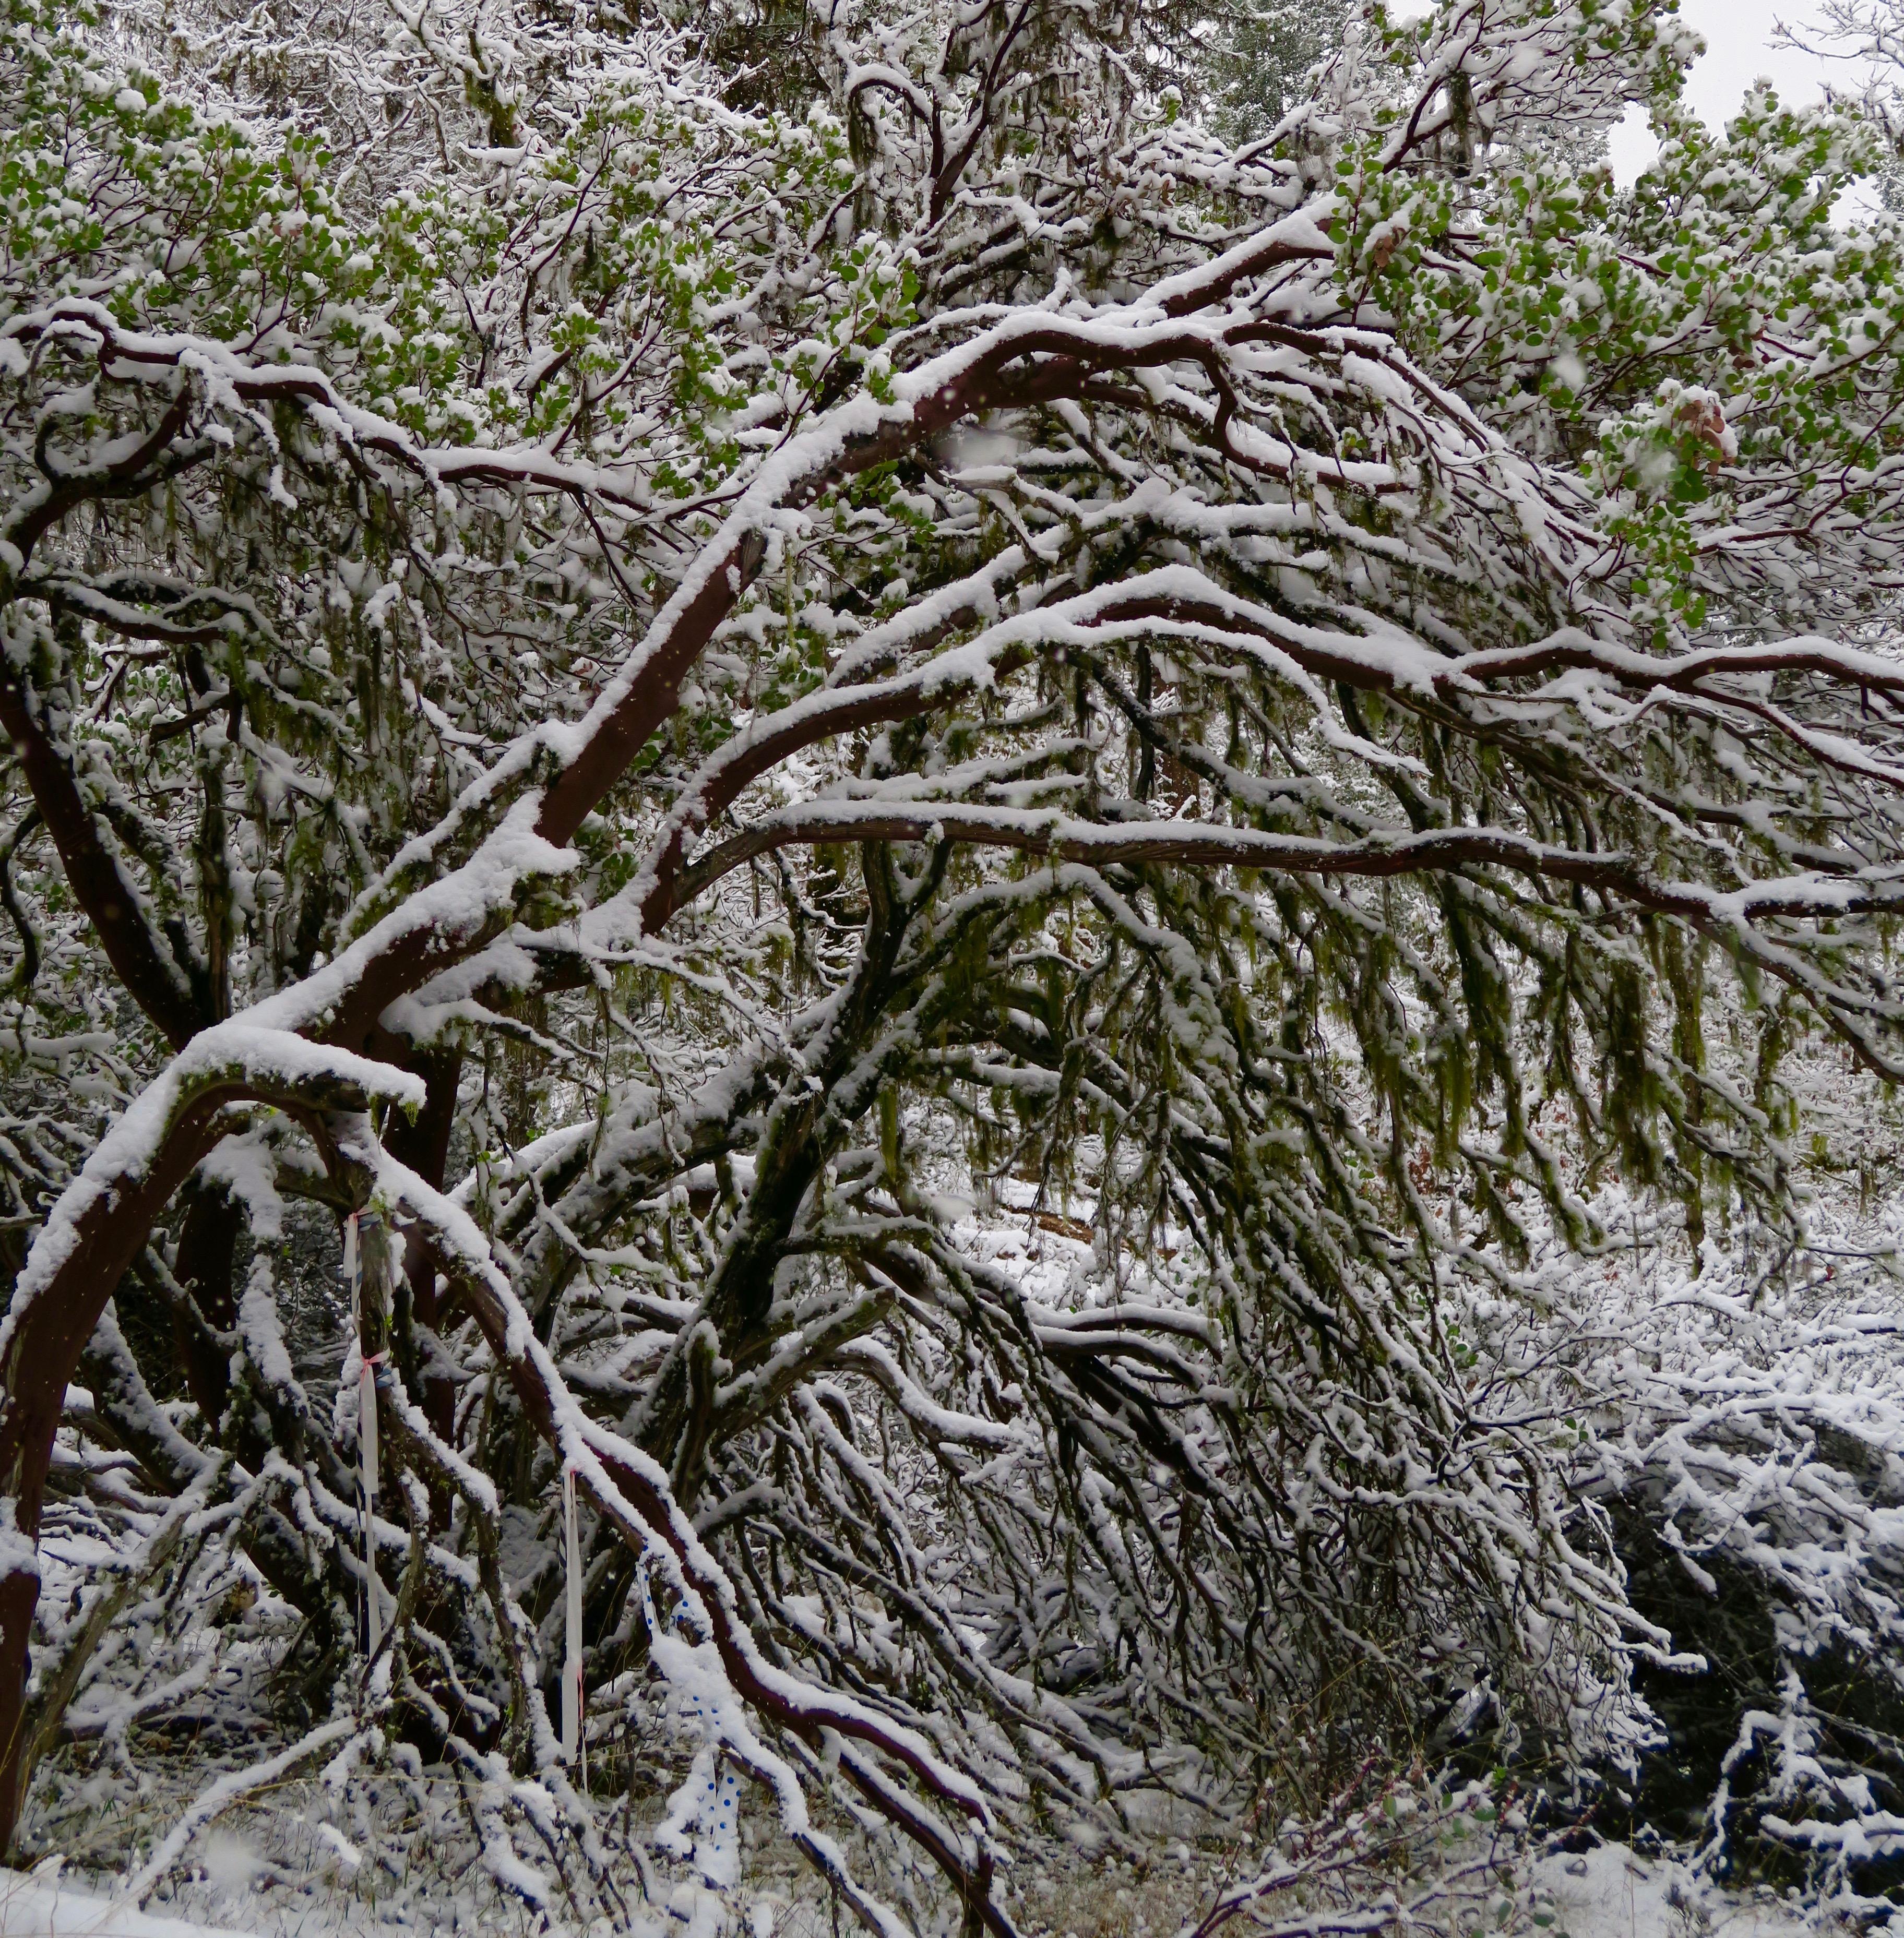 Manzanita in snow, Rogue River National Forest, Upper Applegate River